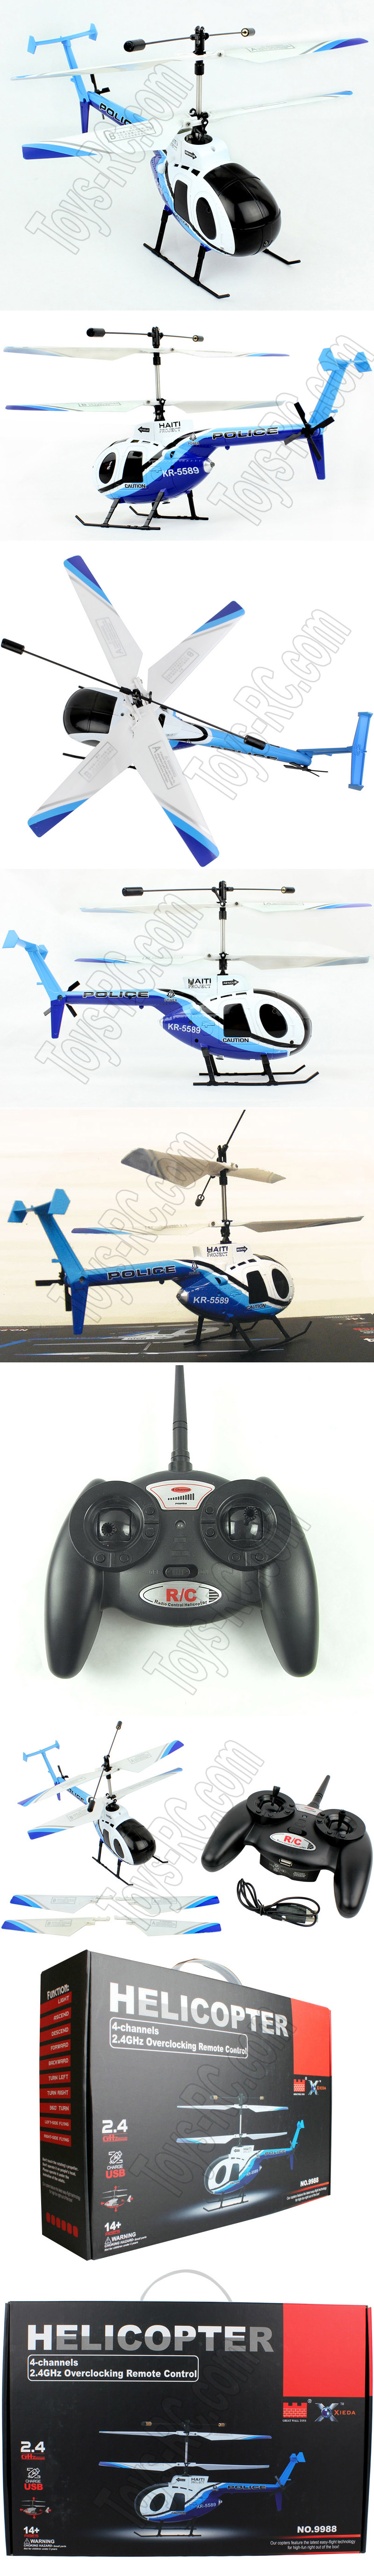 GW XieDa 9988 Hughes OH-6 Cayuse 2.4G 4CH Mini RC Helicopter RTF http://www.toys-rc.com/gw-xieda-9988-hughes-oh6-cayuse-24g-4ch-mini-rc-helicopter-rtf-p-364.html